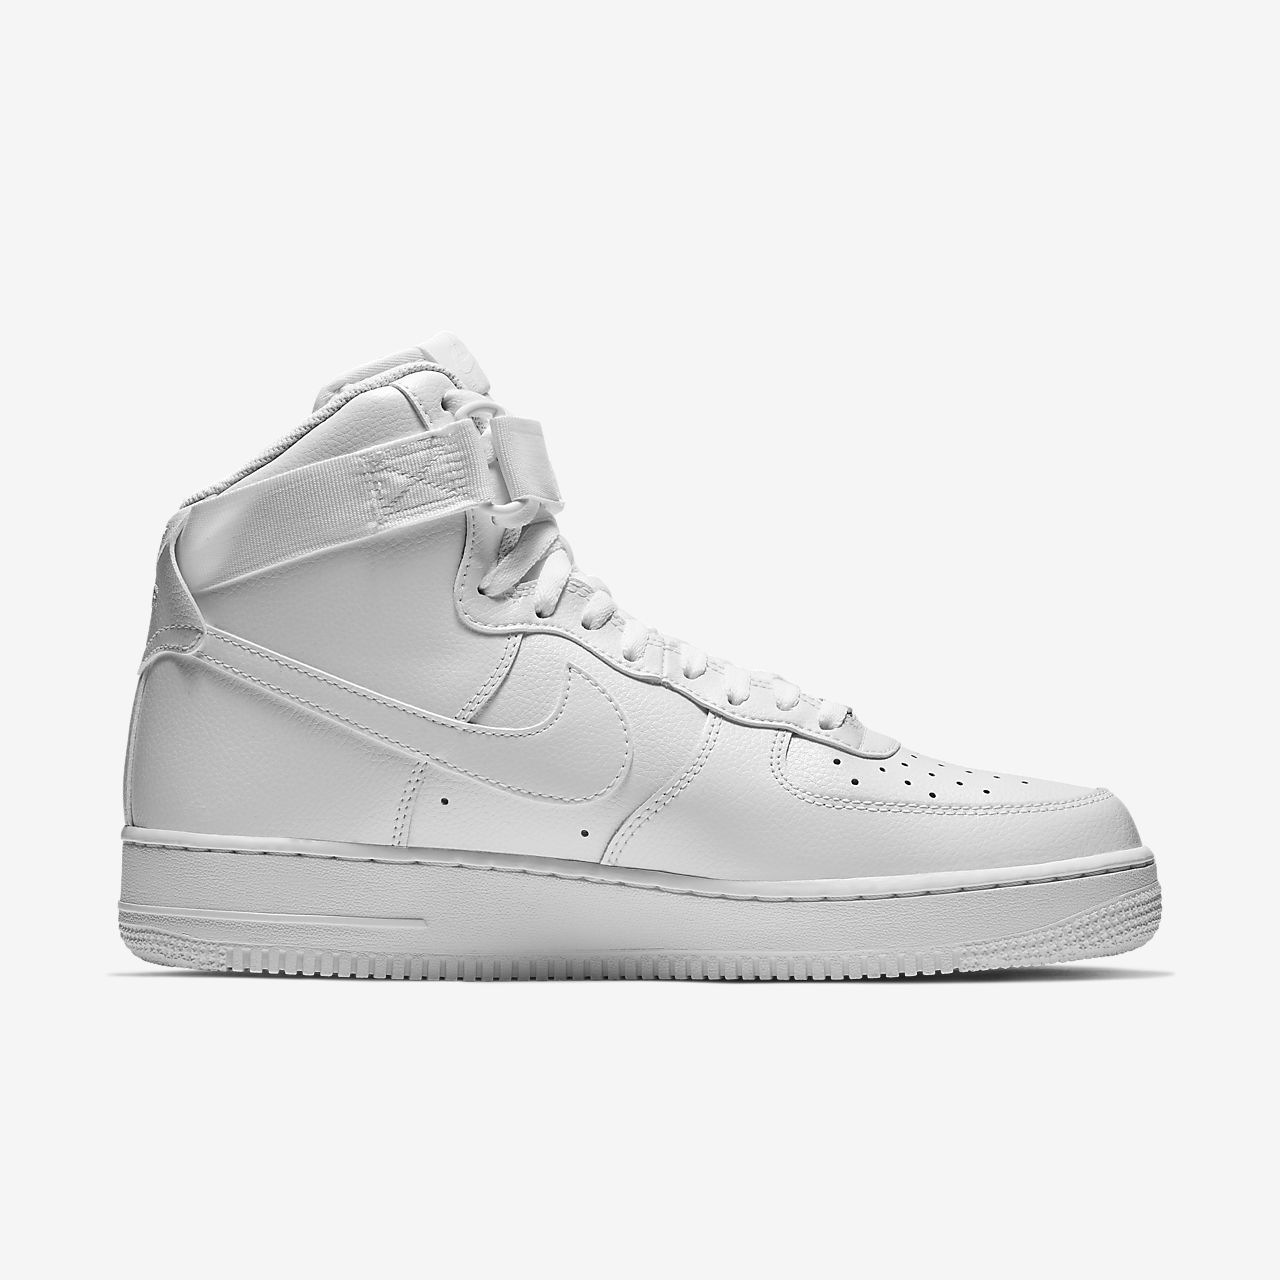 Nike Shoes High Top Boys